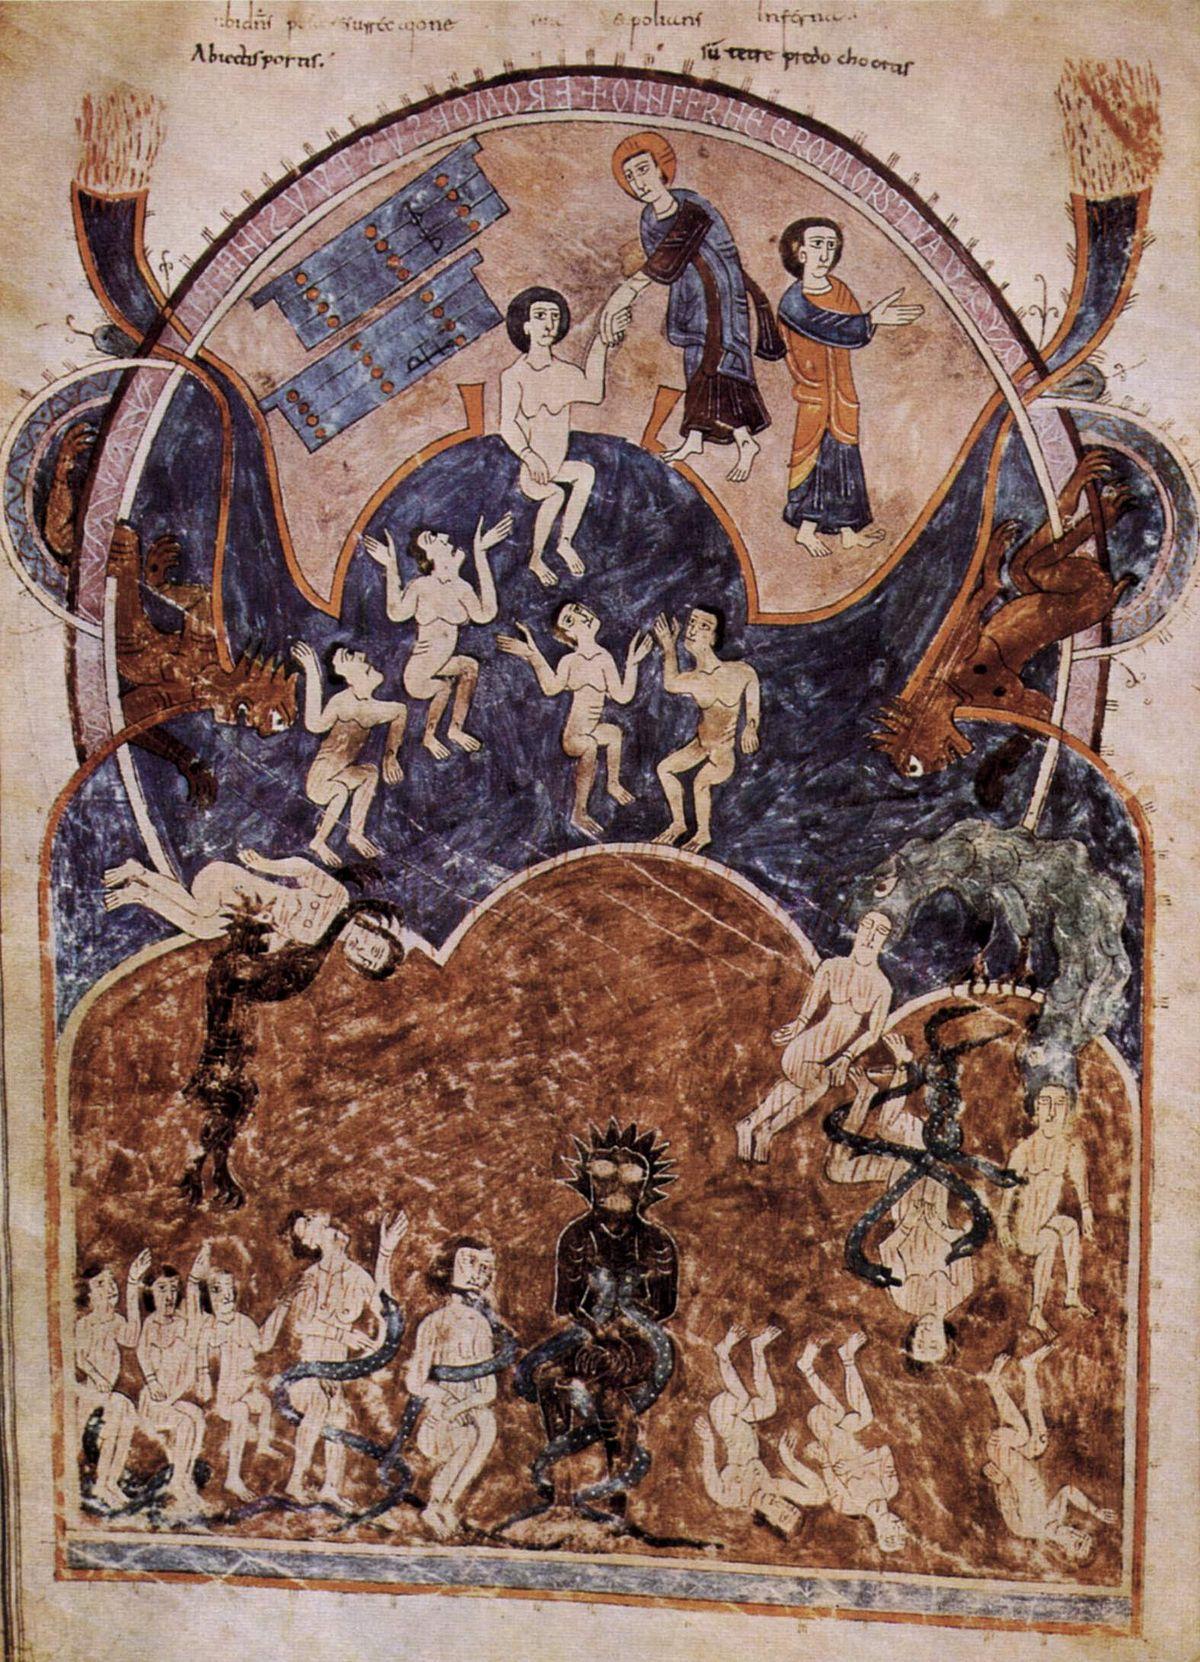 File:Ende (Meisterin der Schule von Távara) 002.jpg - Wikimedia Commons